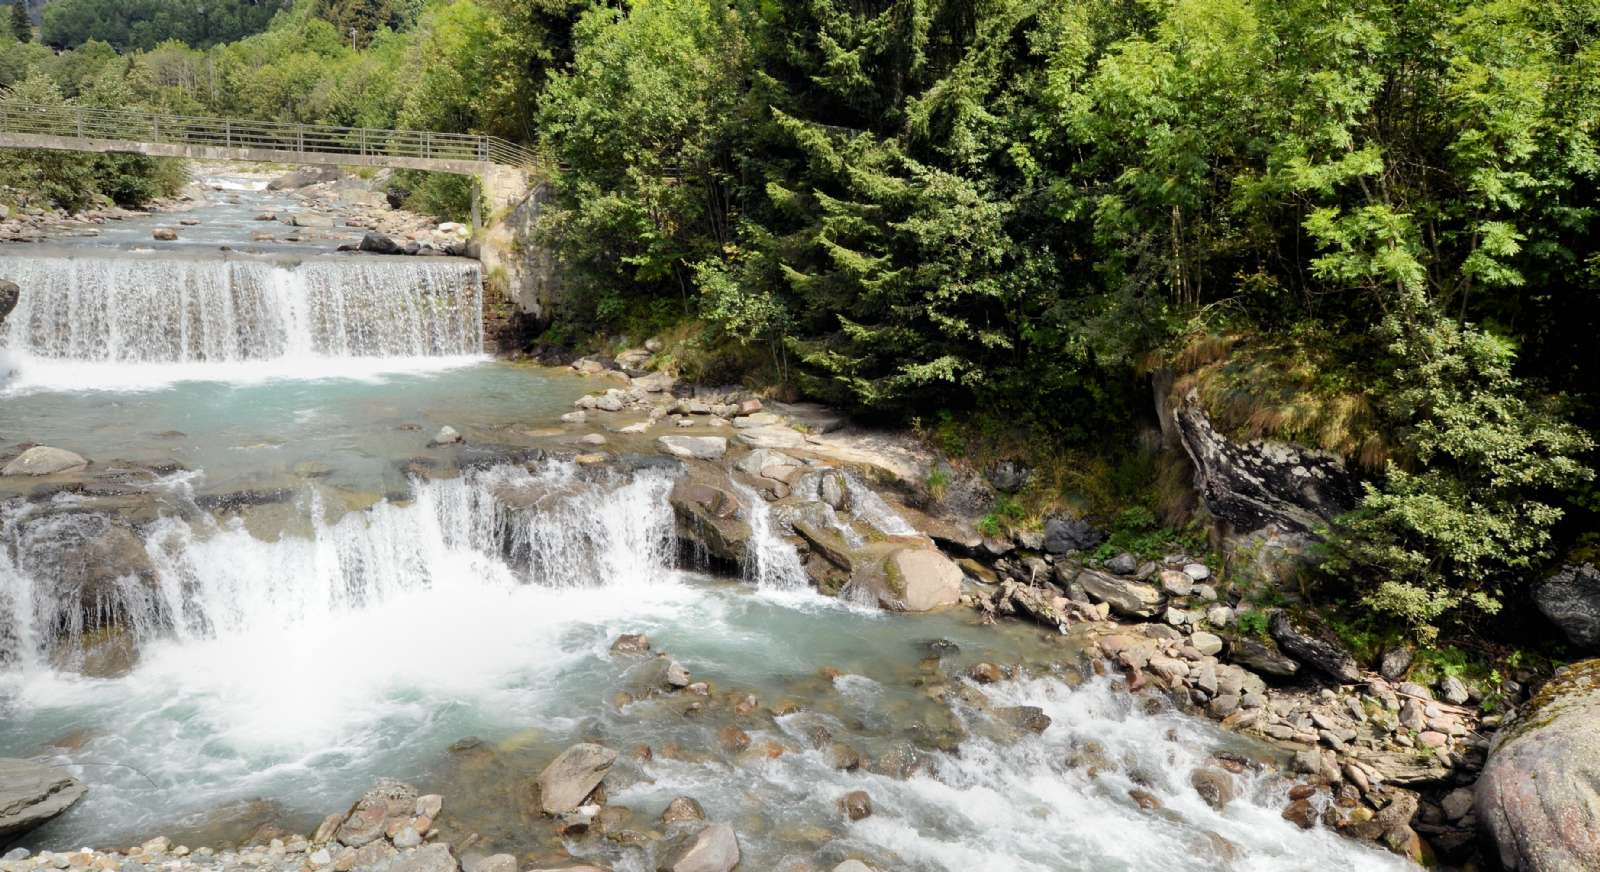 Floden Sesia